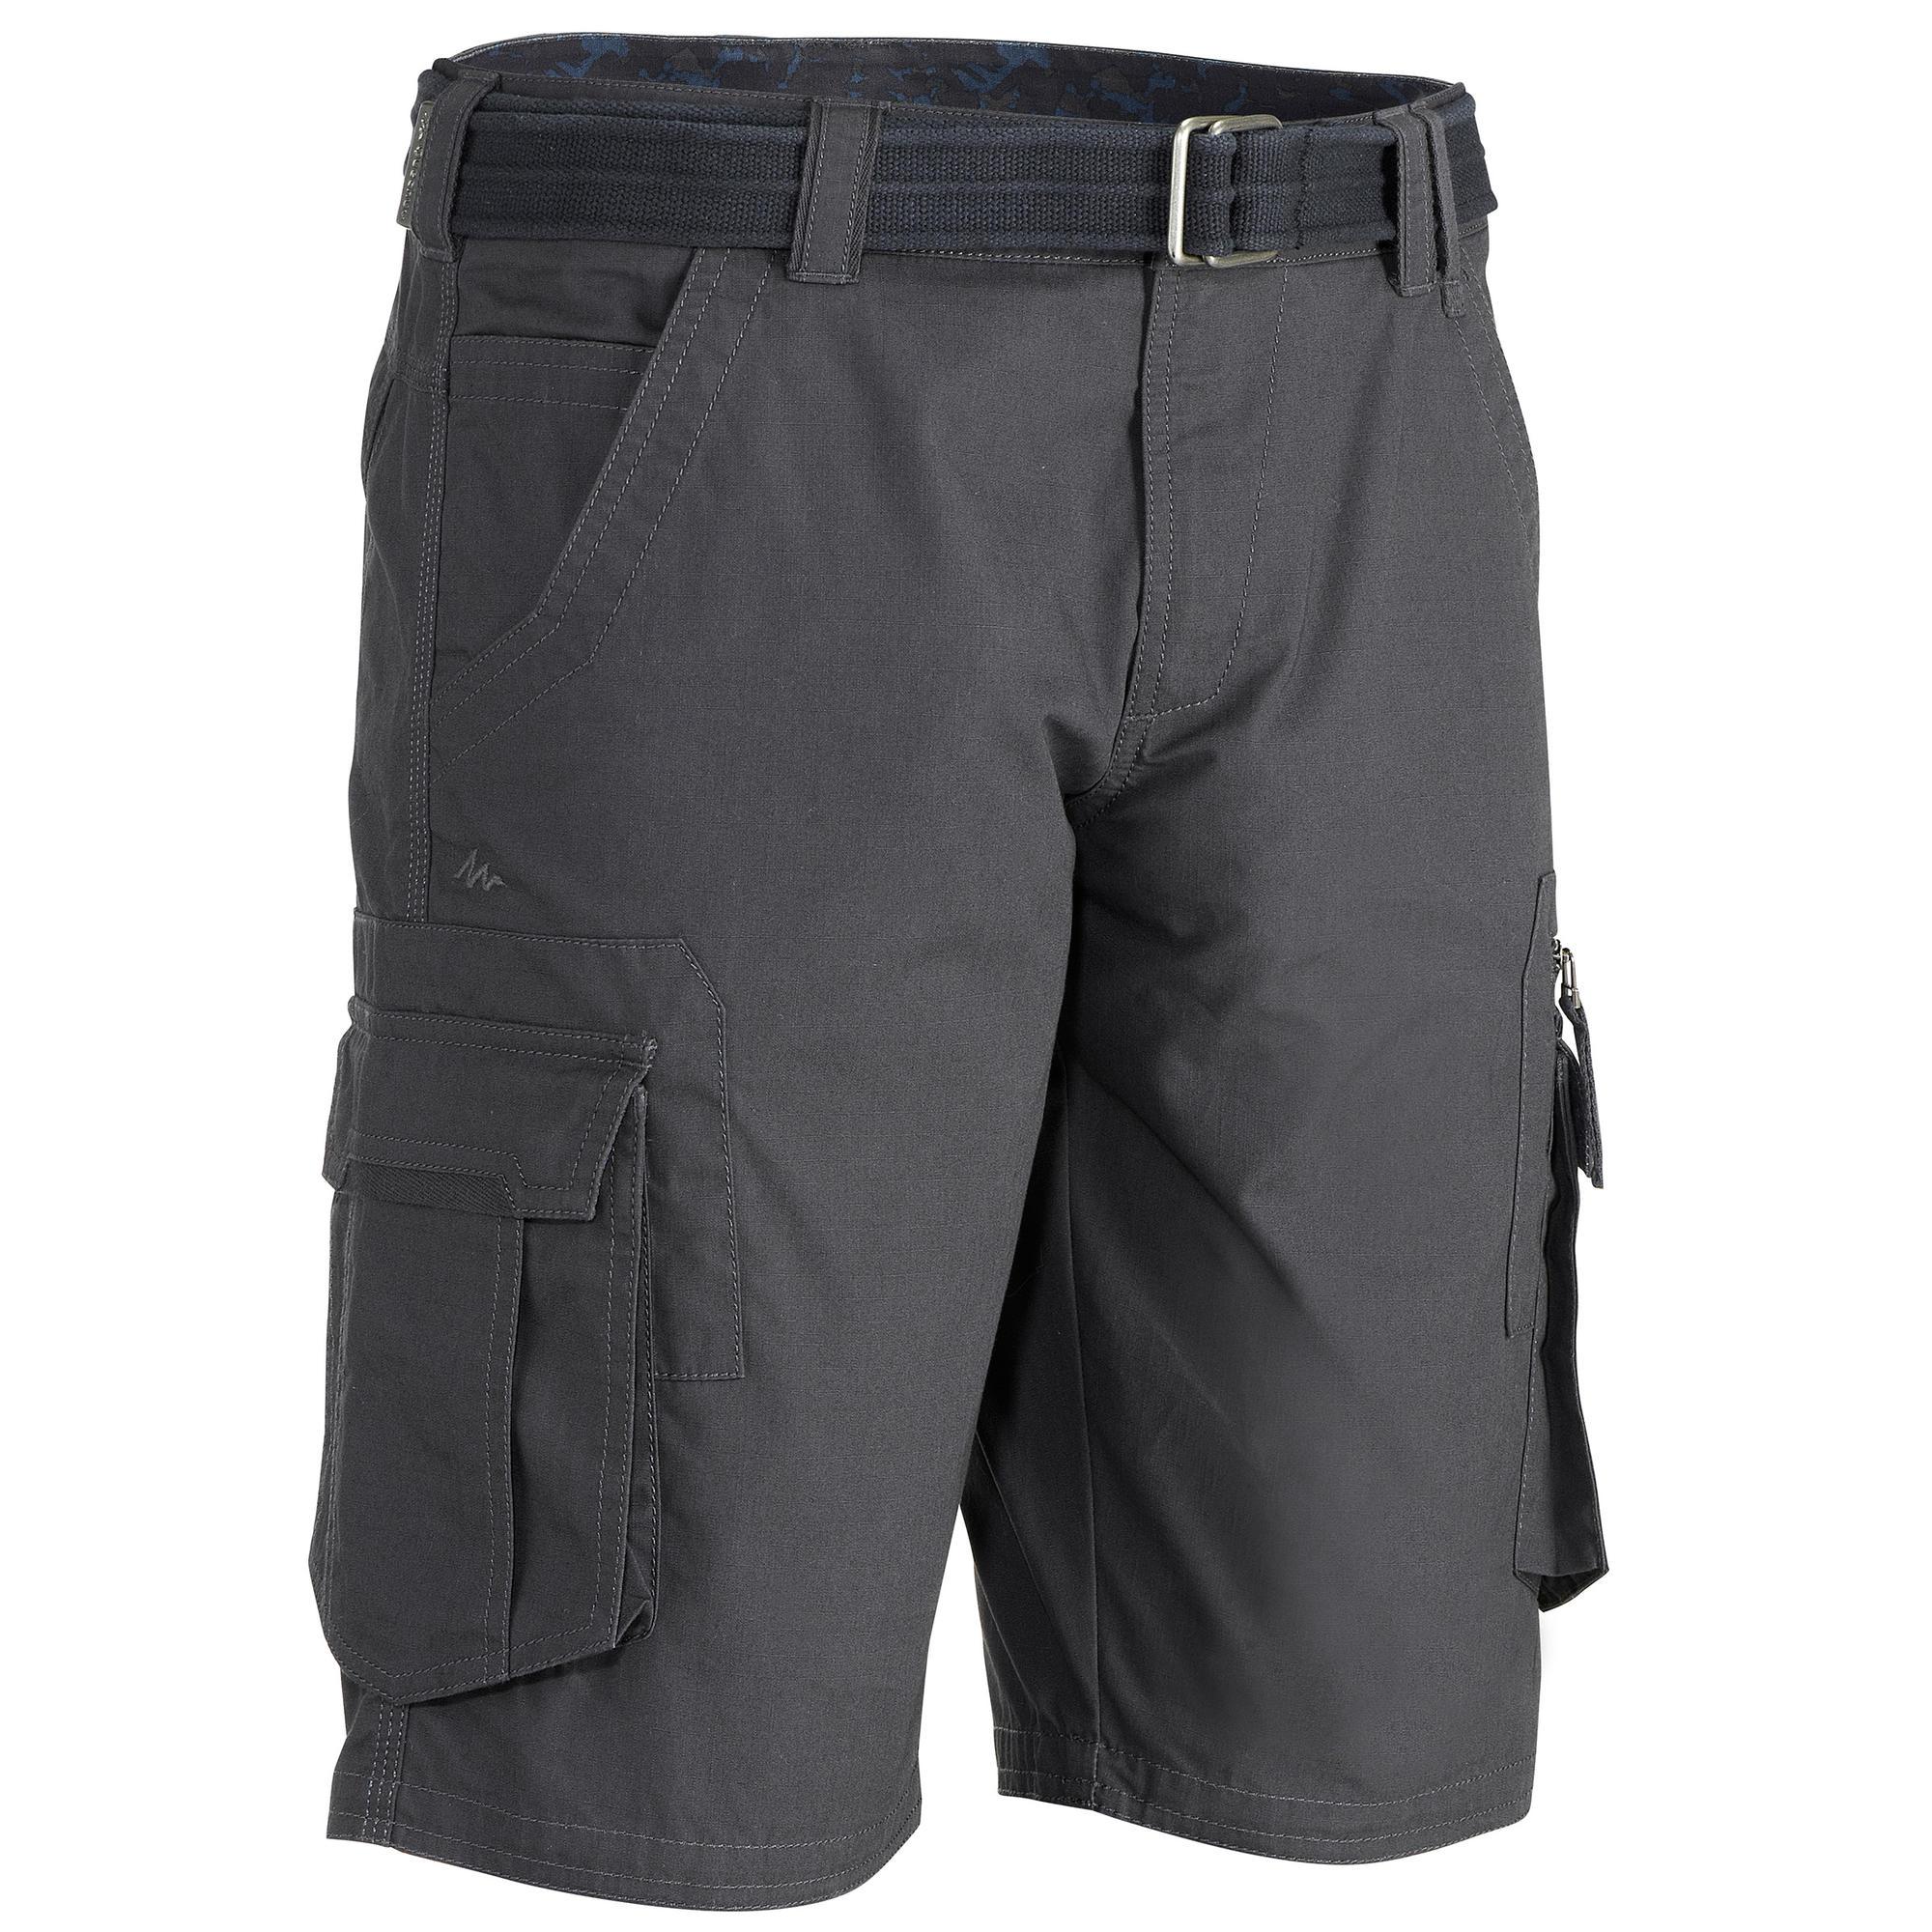 Men's Arpenaz 500 cargo grey trekking shorts   Quechua